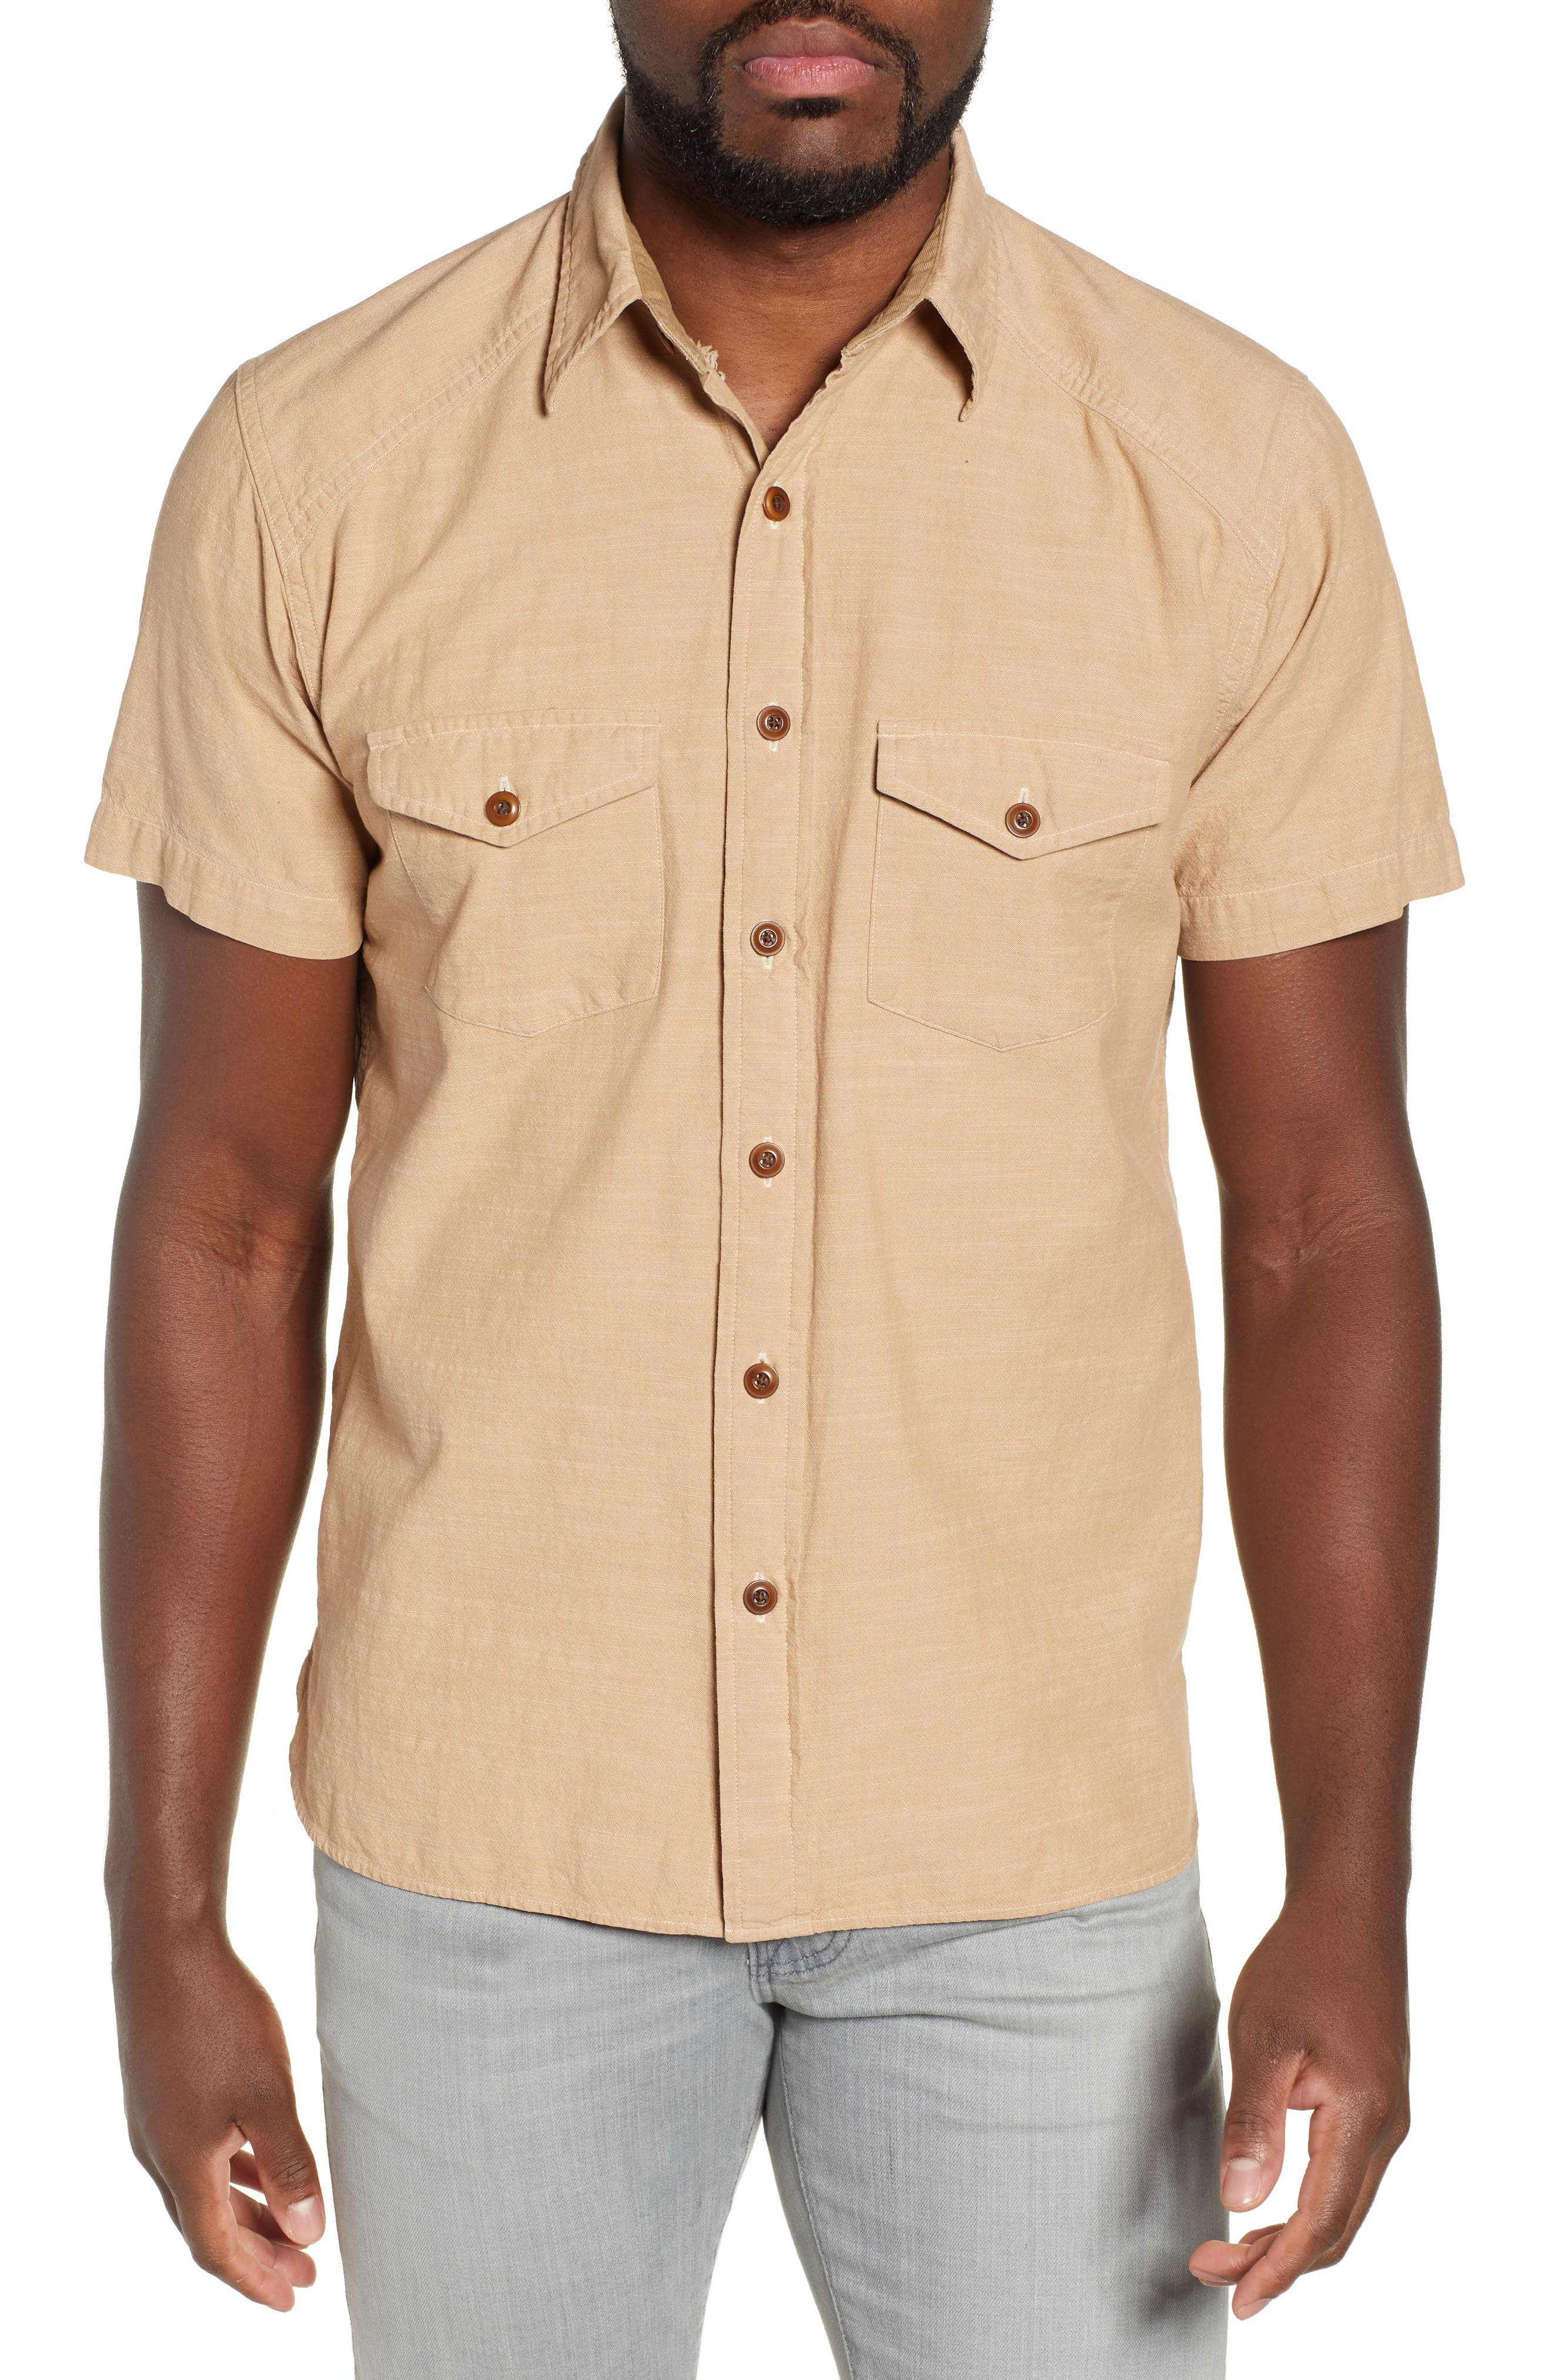 FRYE, Addison Chambray Woven Shirt, Main thumbnail 1, color, KRAFT BROWN